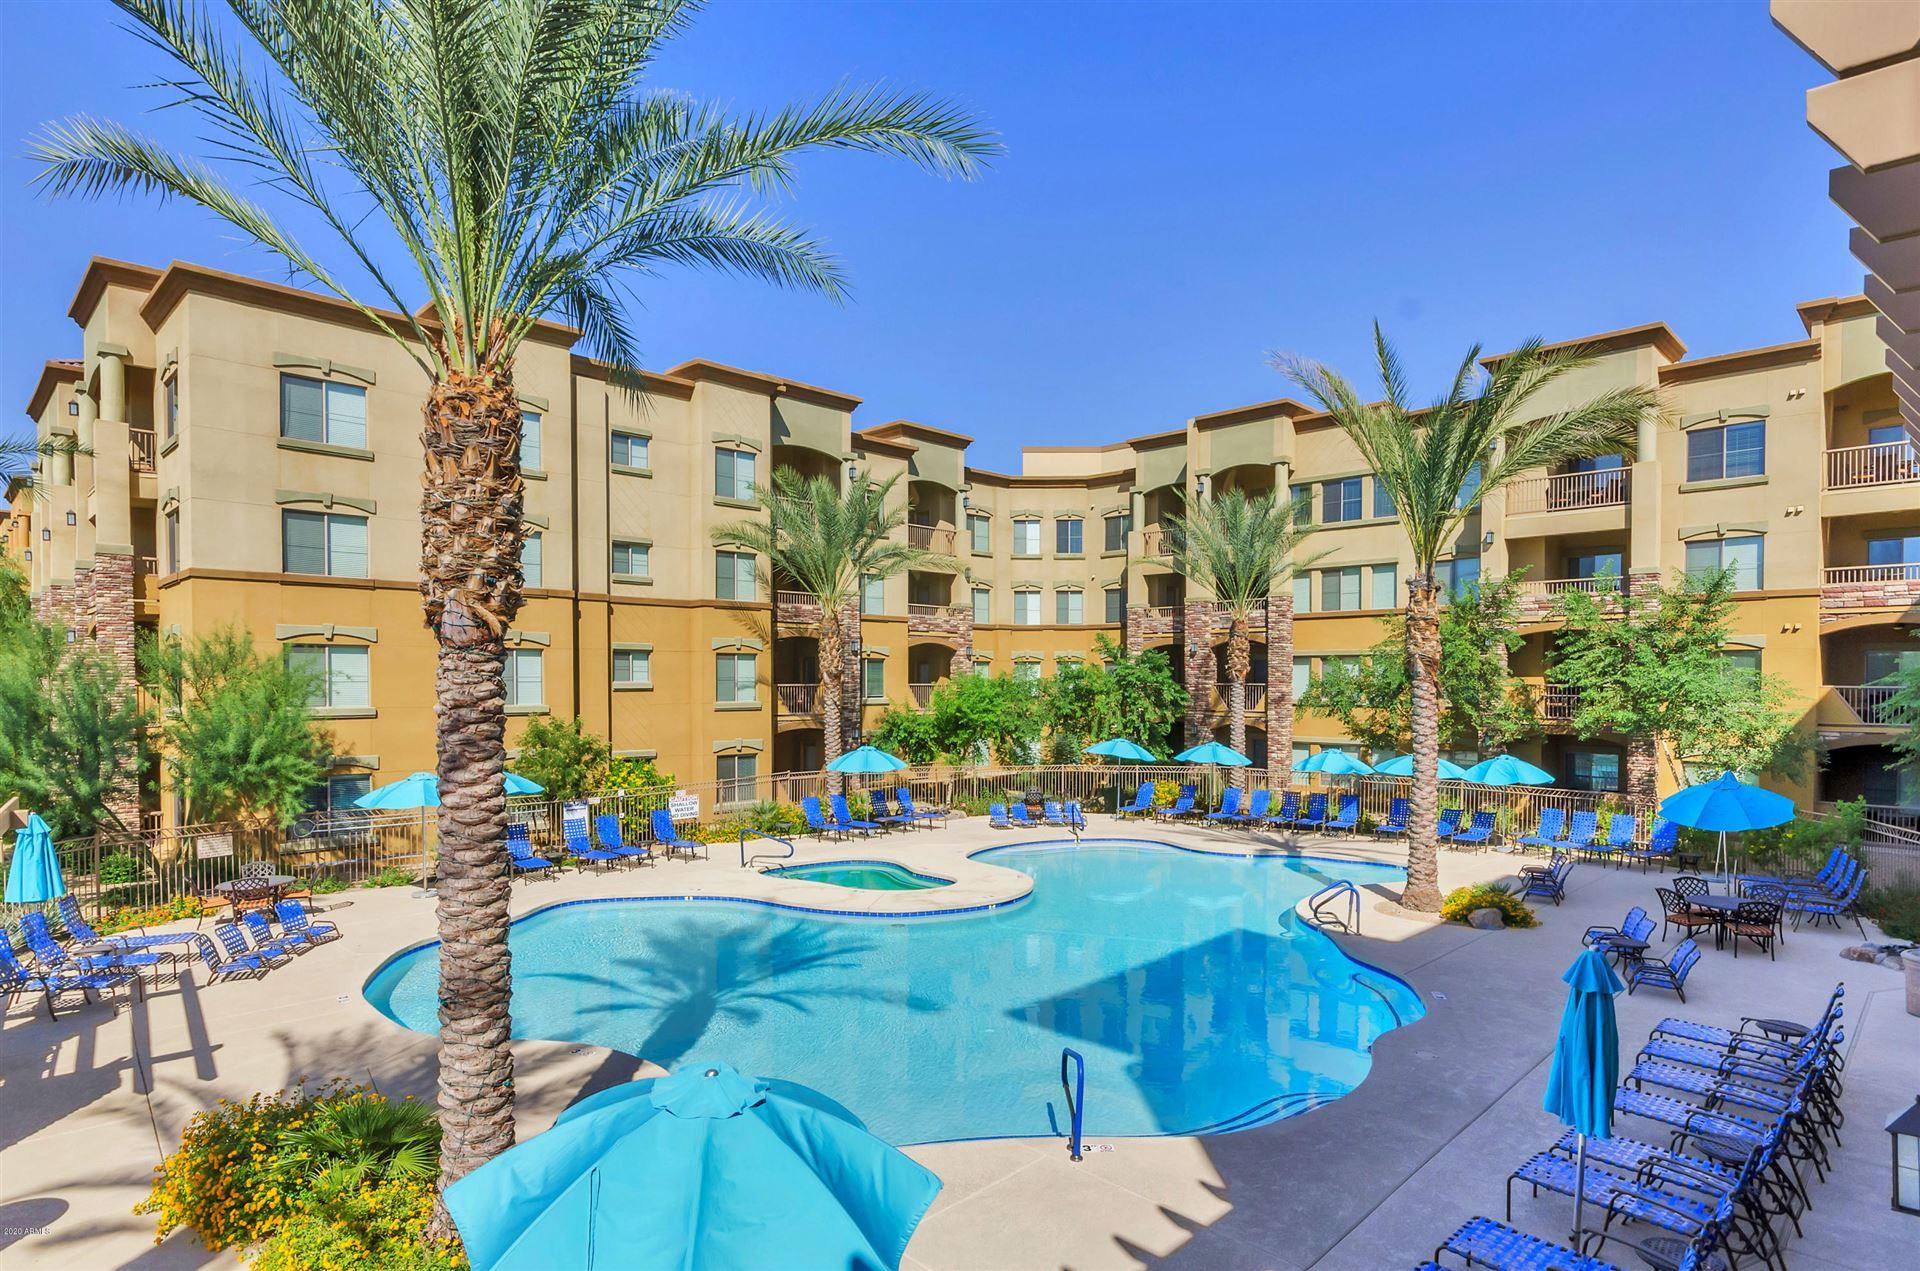 5450 E DEER VALLEY Drive #3180, Phoenix, AZ 85054 - MLS#: 6044825